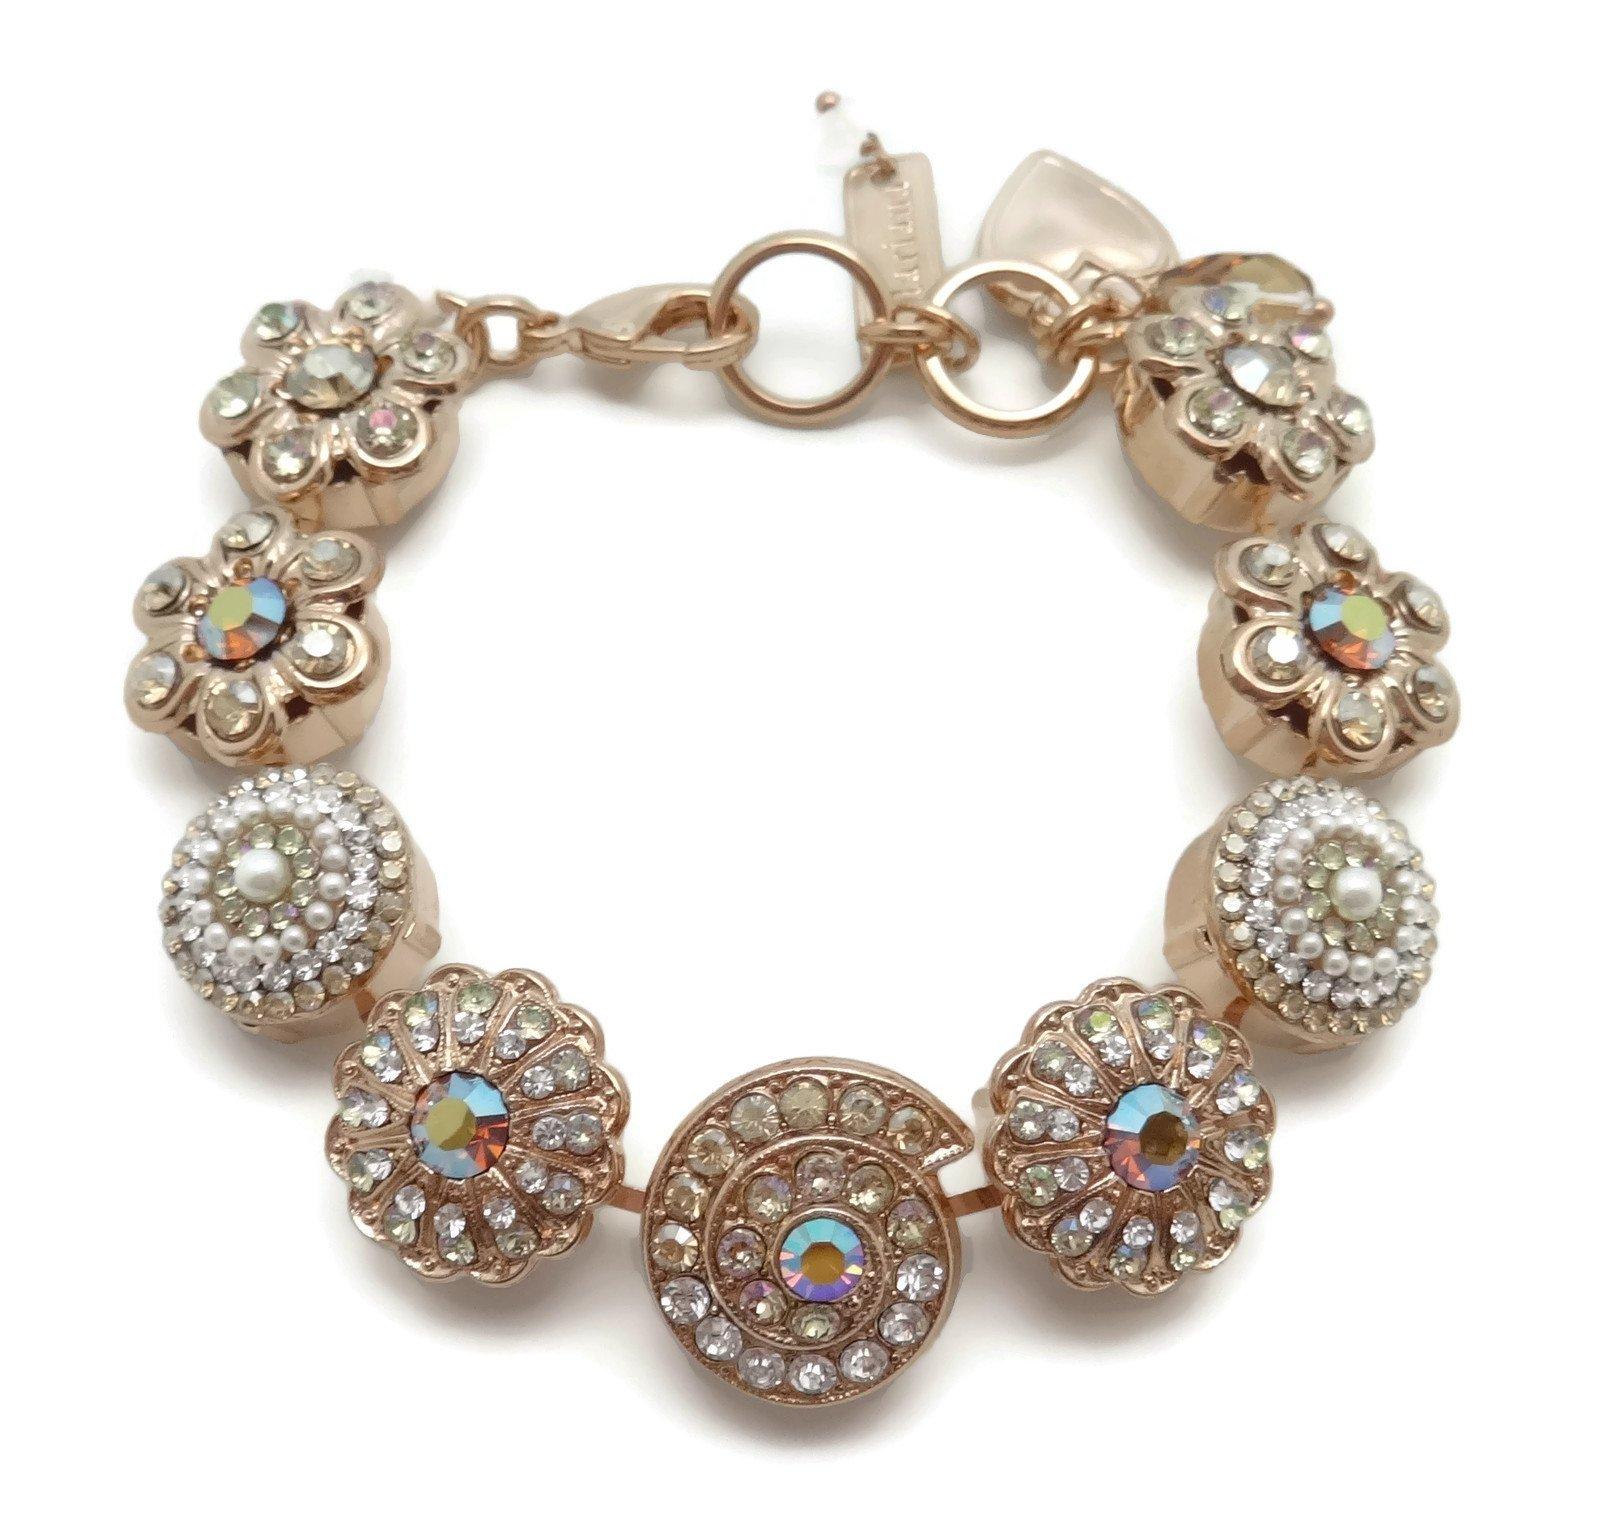 Mariana Rose Gold Plated Swarovski Crystal Mosaic Bracelet 1093 Odyssey Aurora